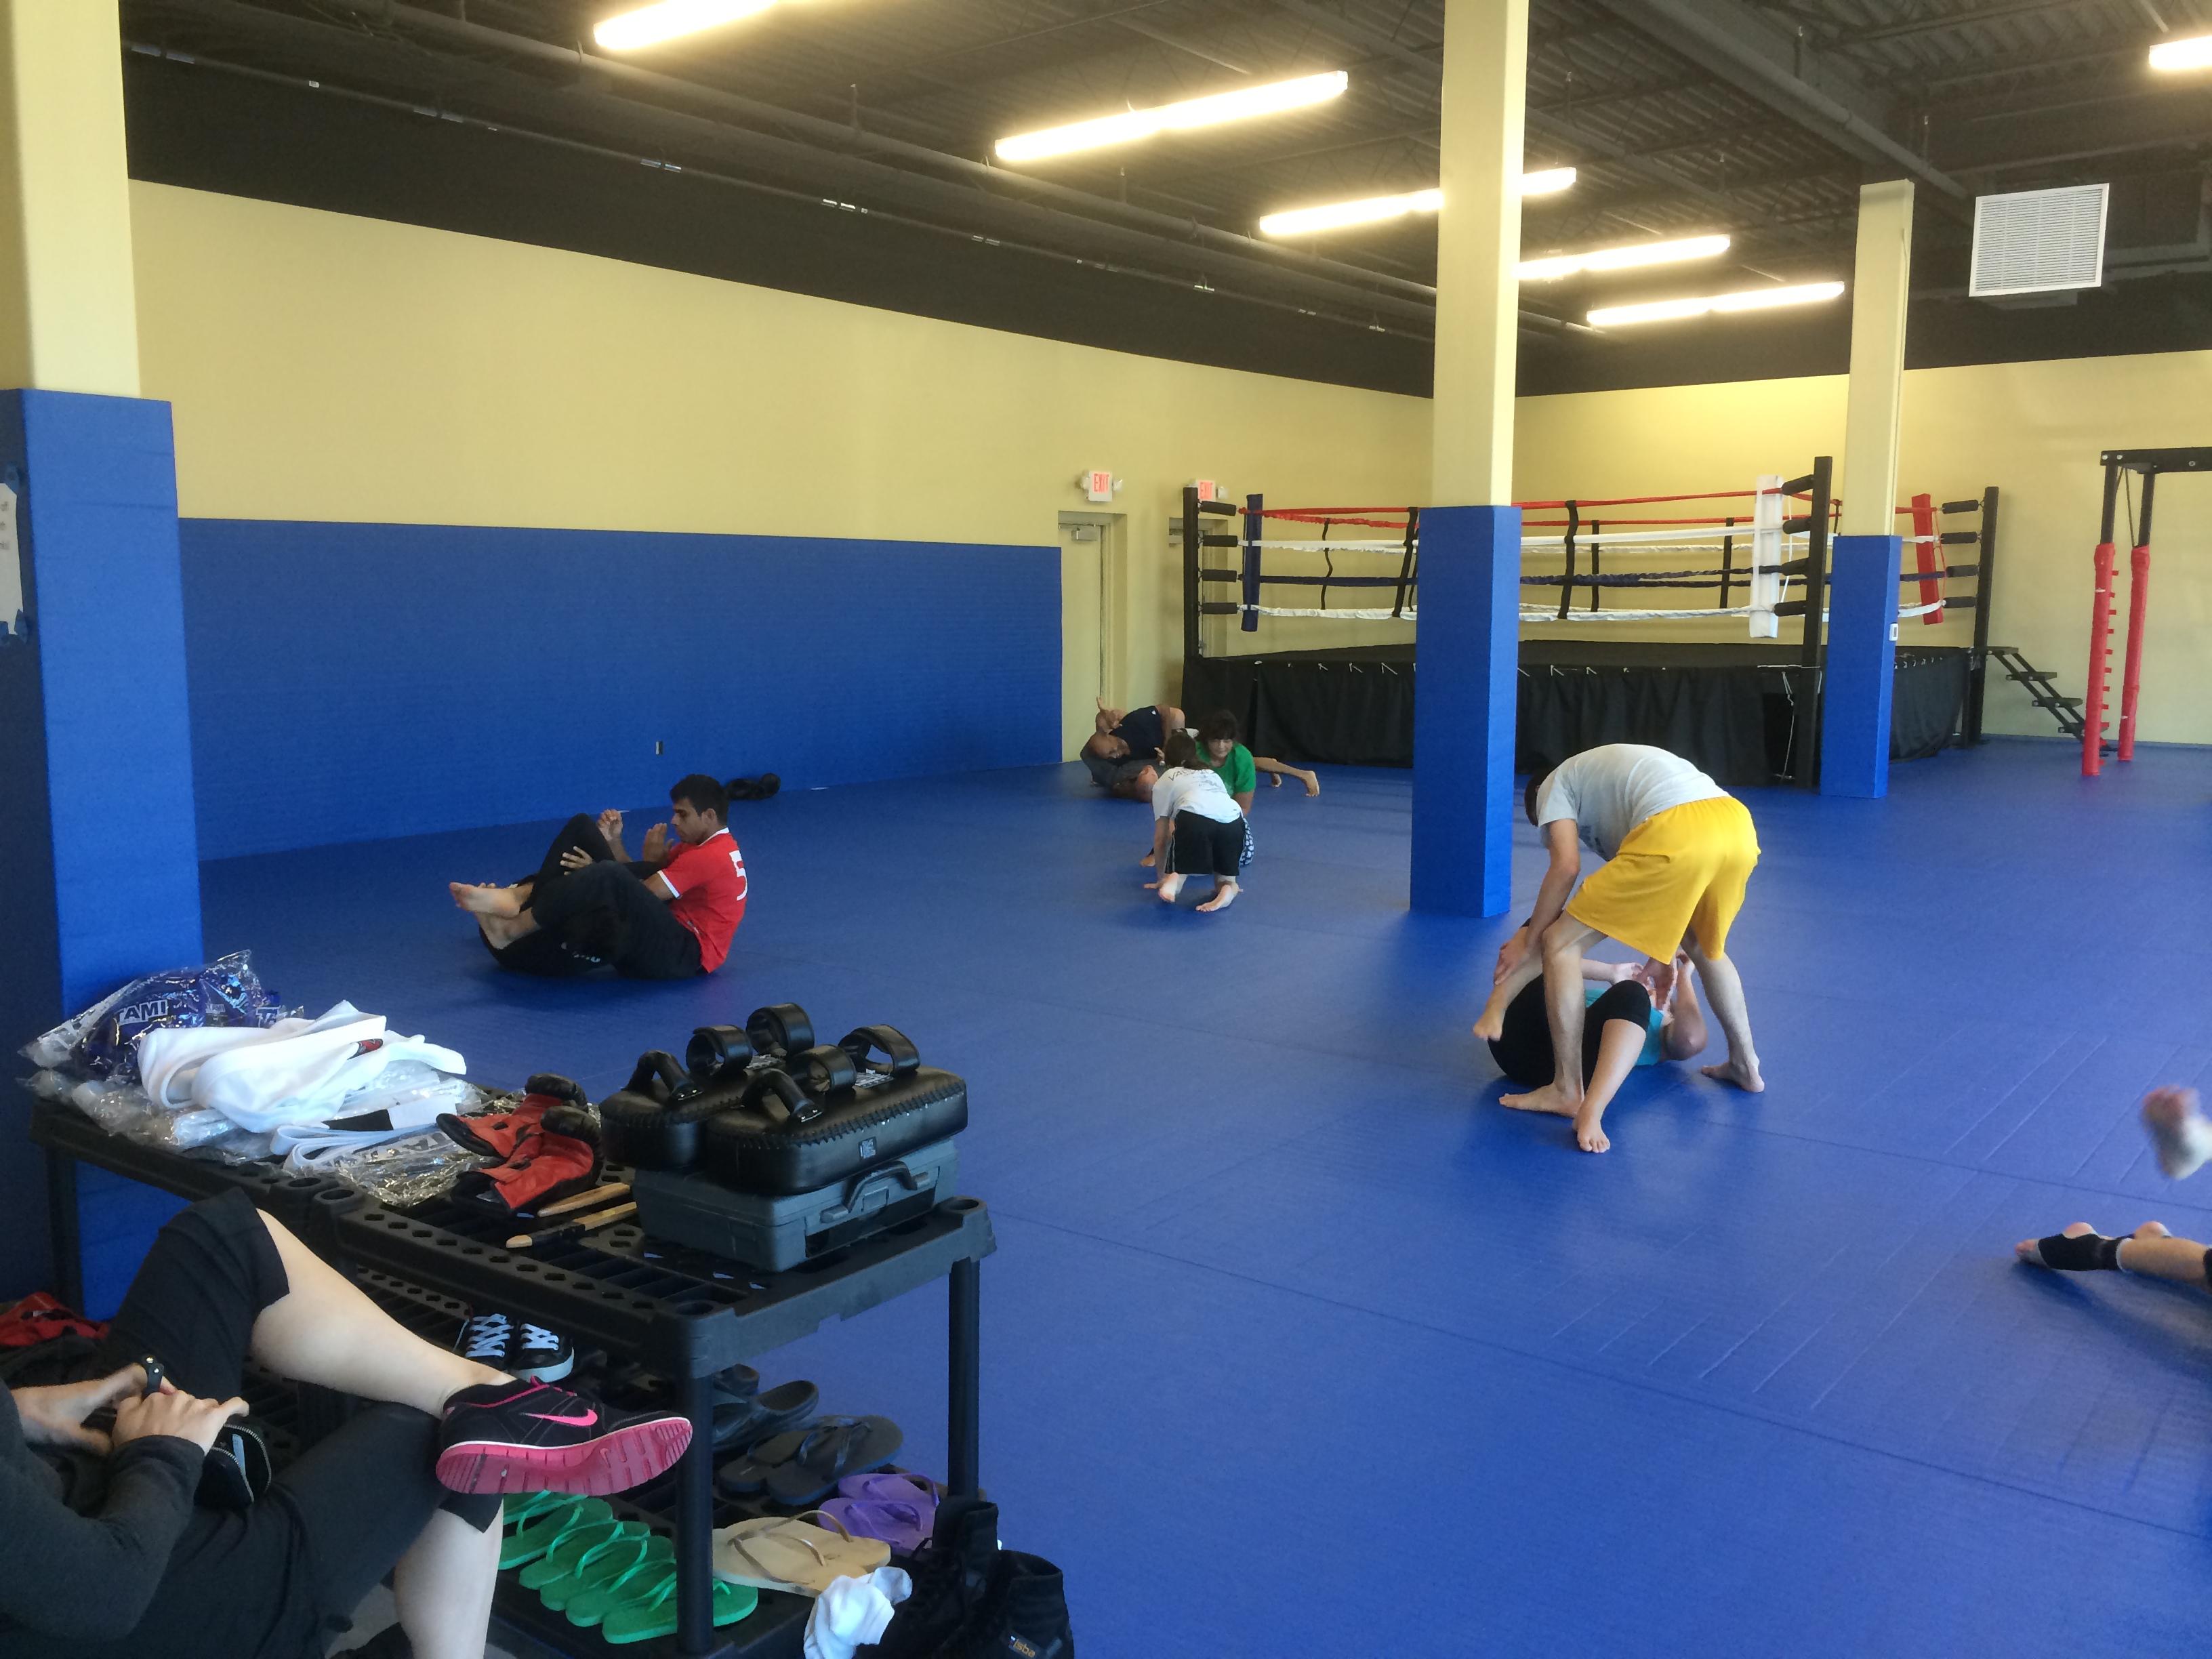 Valhalla Academy of Martial Arts image 6